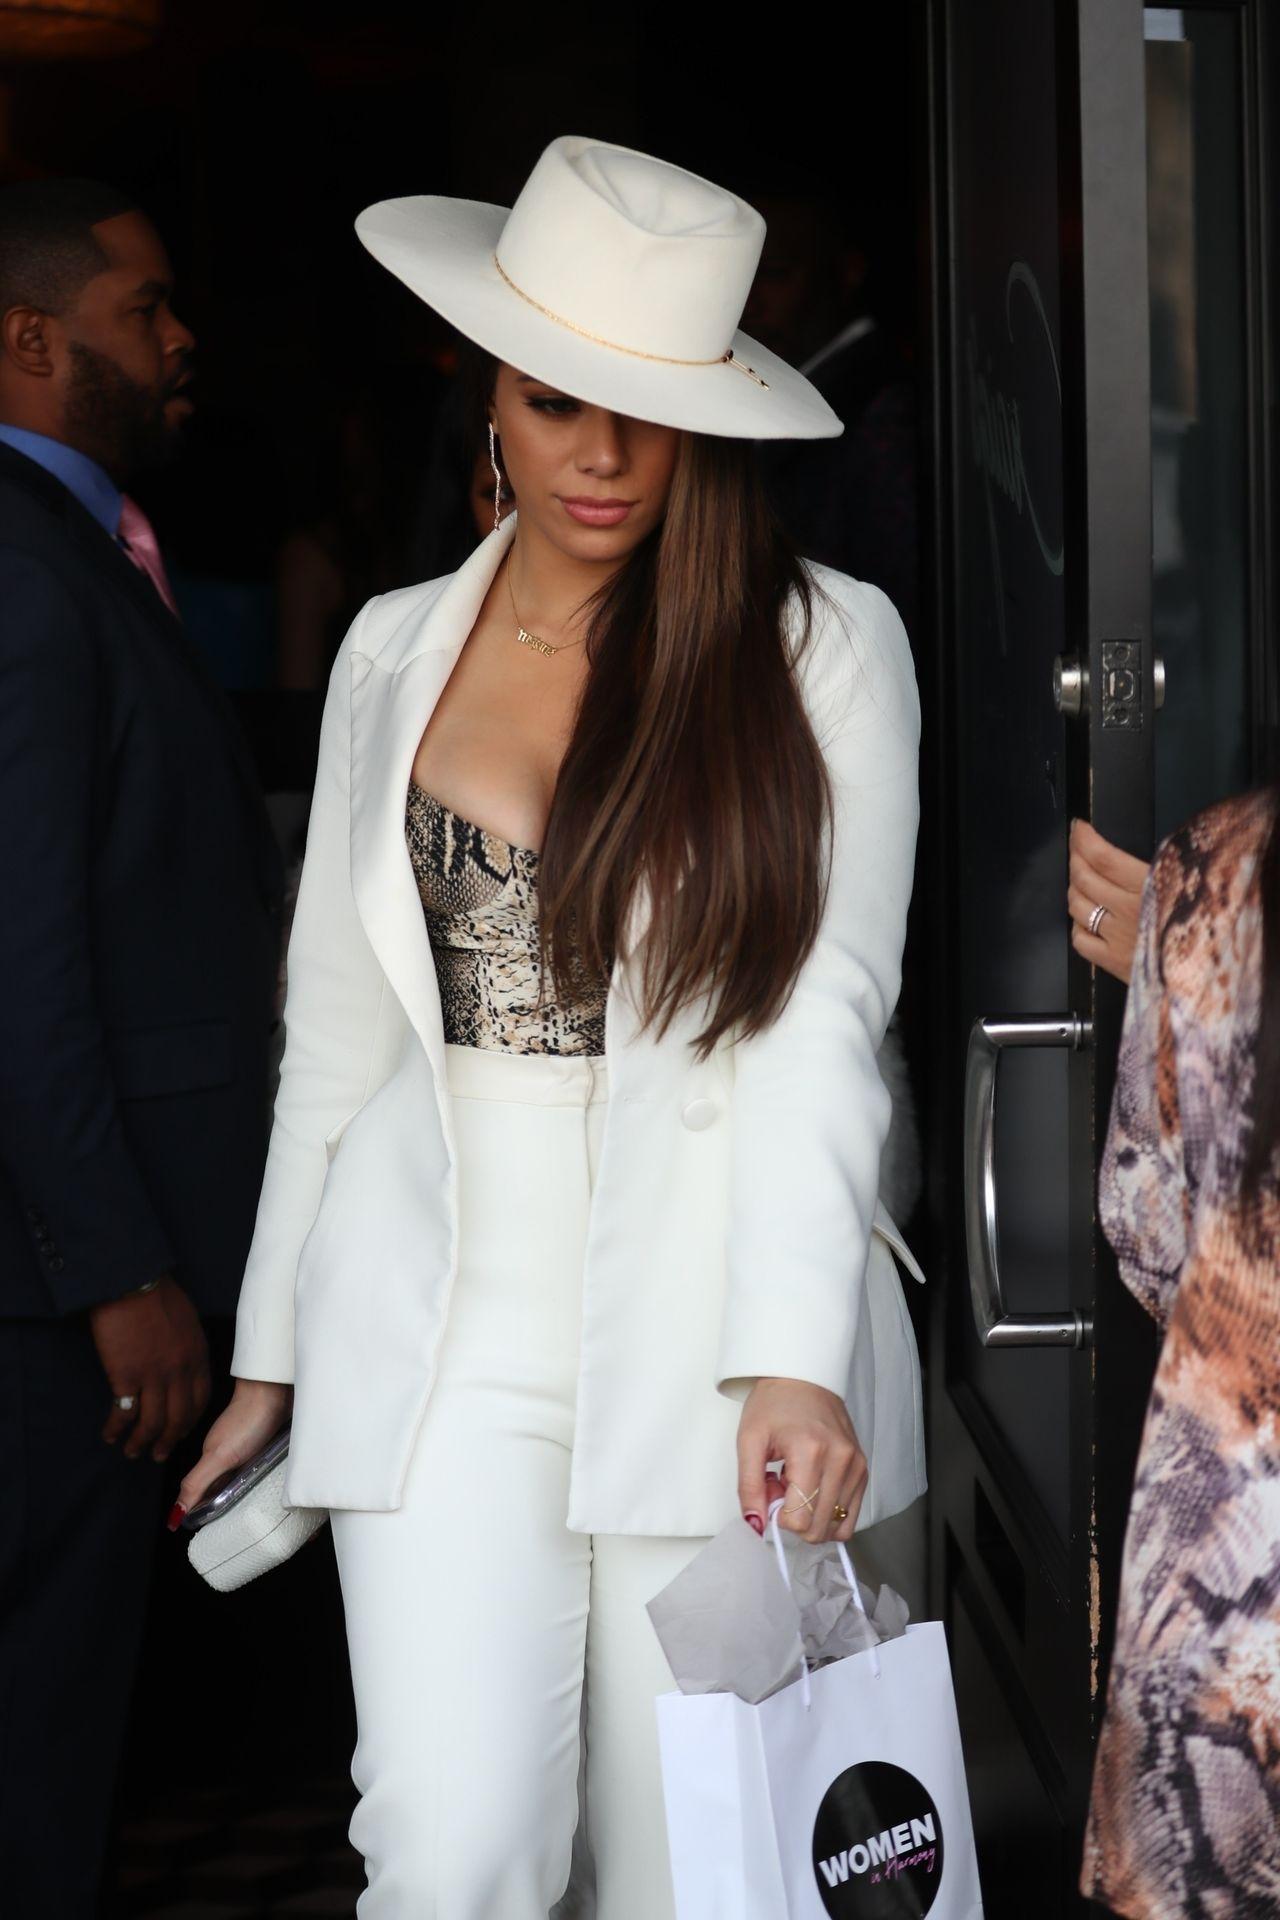 Dinah Jane Departs The Women In Harmony Pre Grammy Luncheon 0020